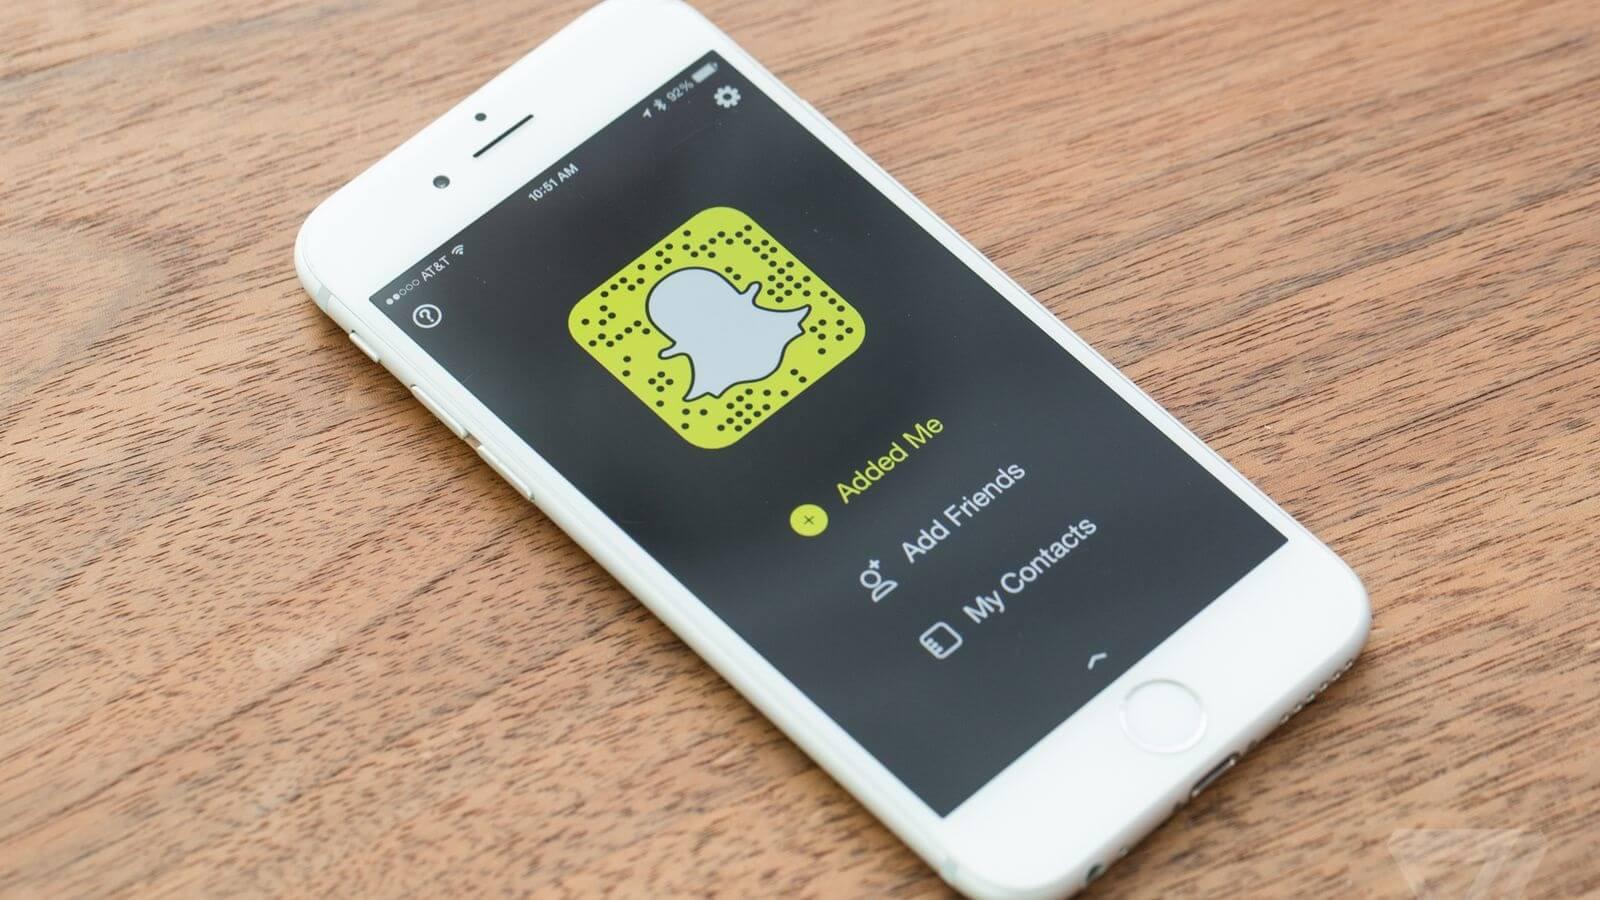 snapchat-stock-0973-0-0